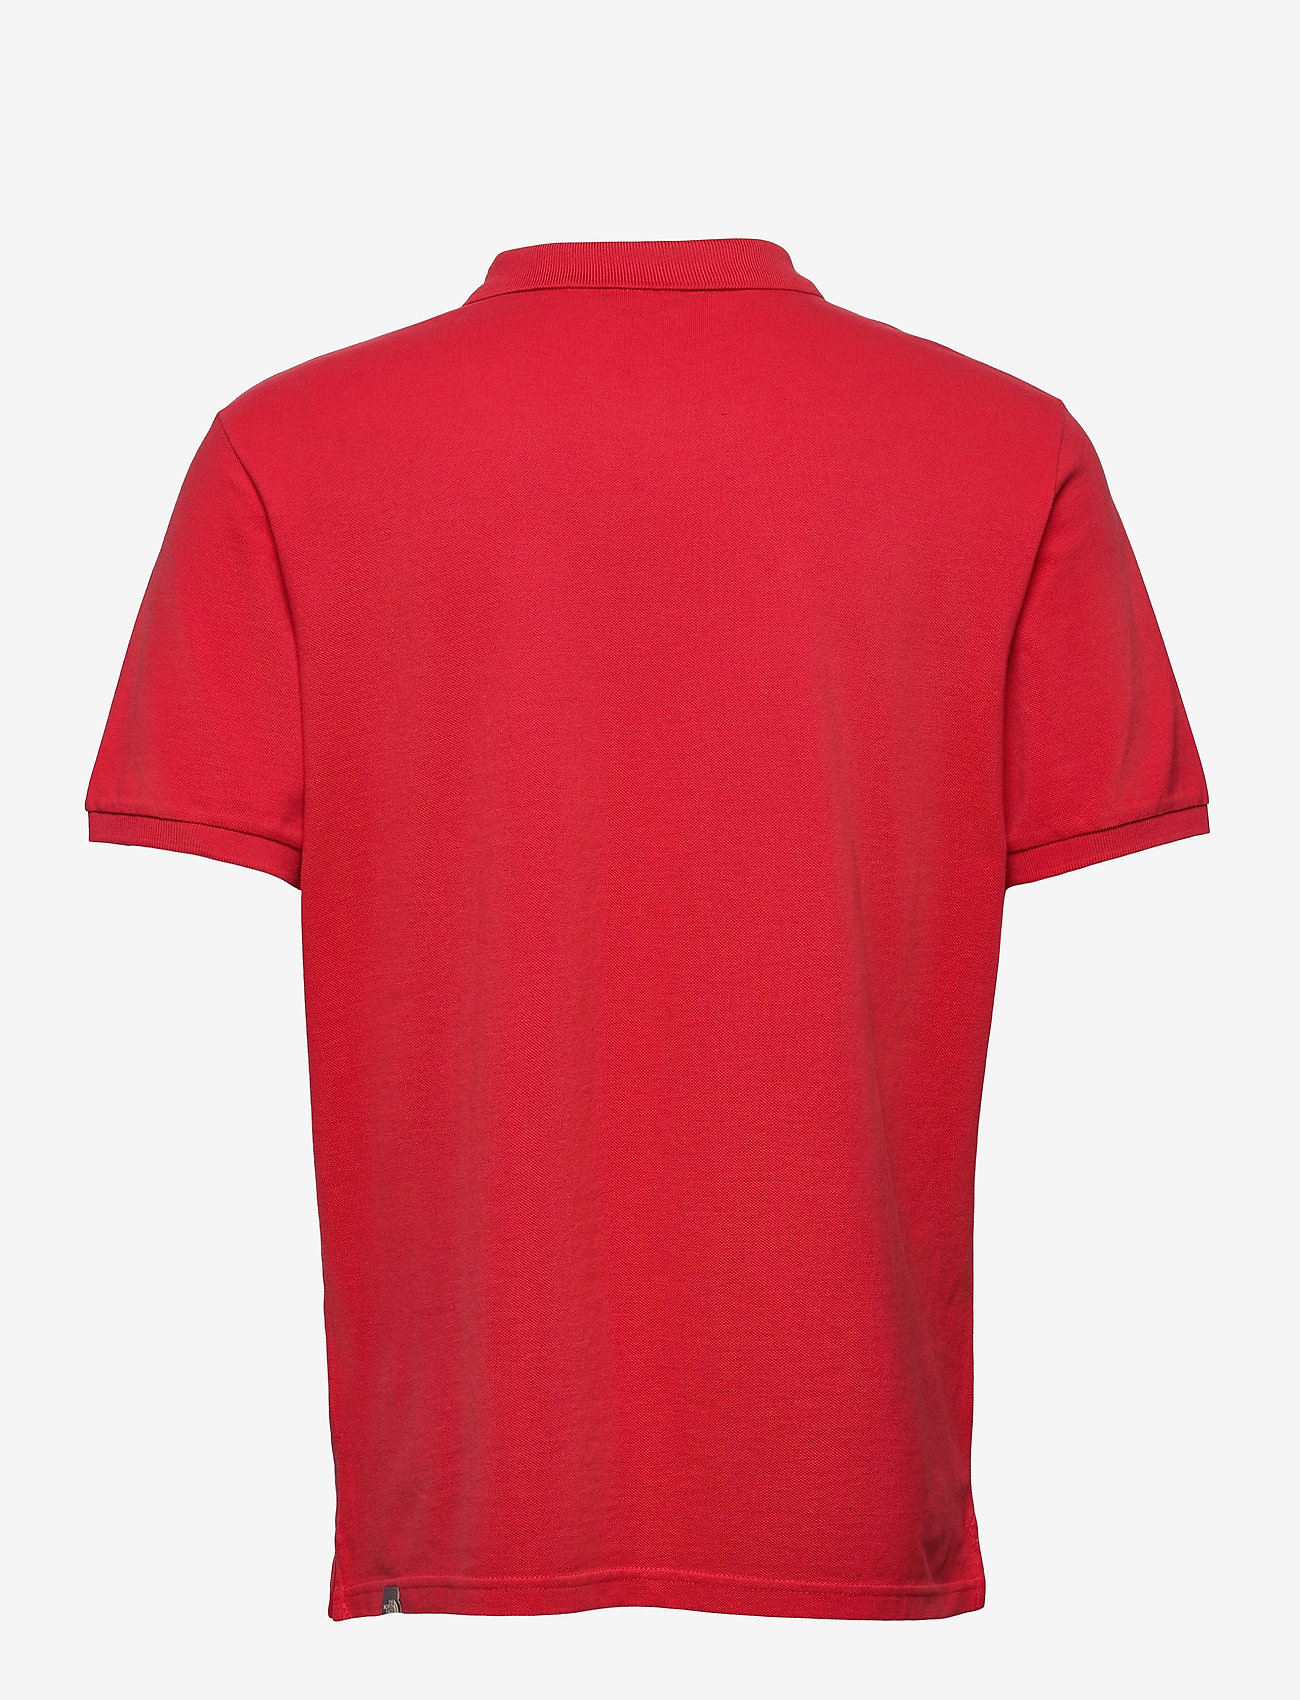 The North Face - M POLO PIQUET - polos à manches courtes - rococco red - 1